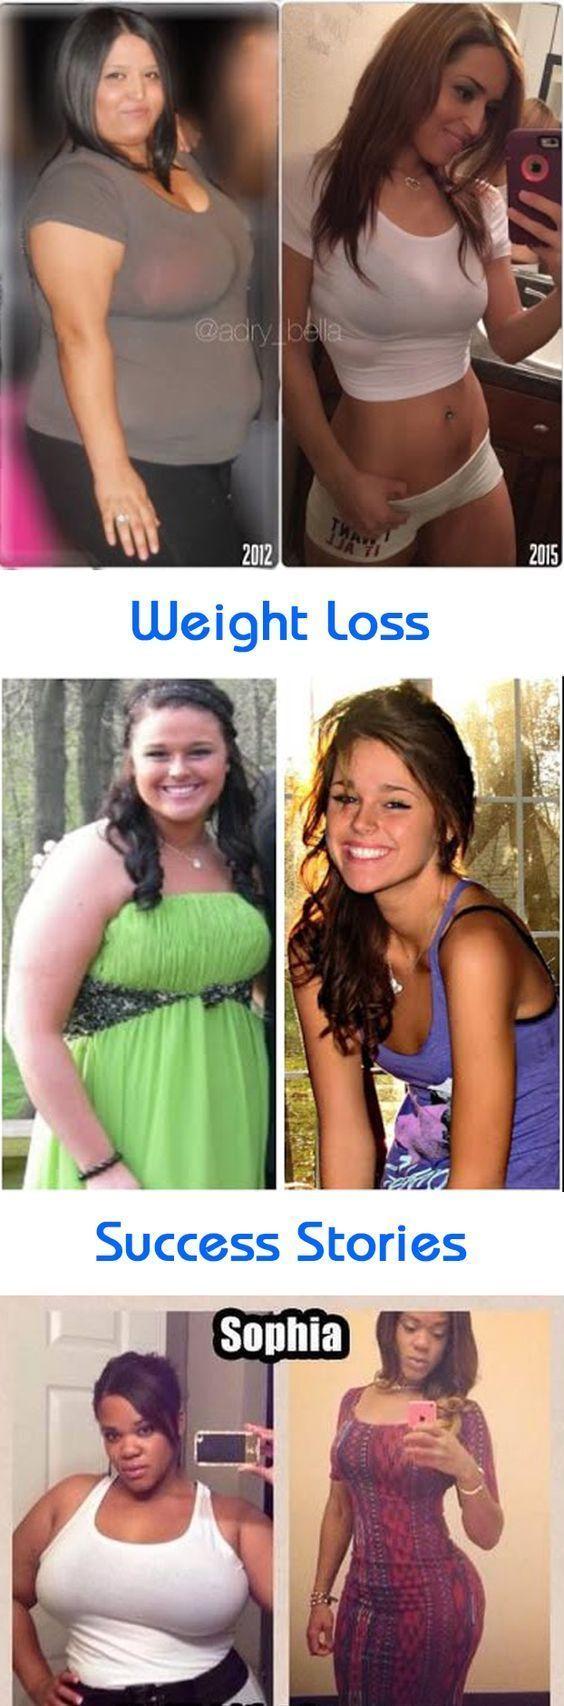 #SuccessStory #weightlossbeforesuccessstory